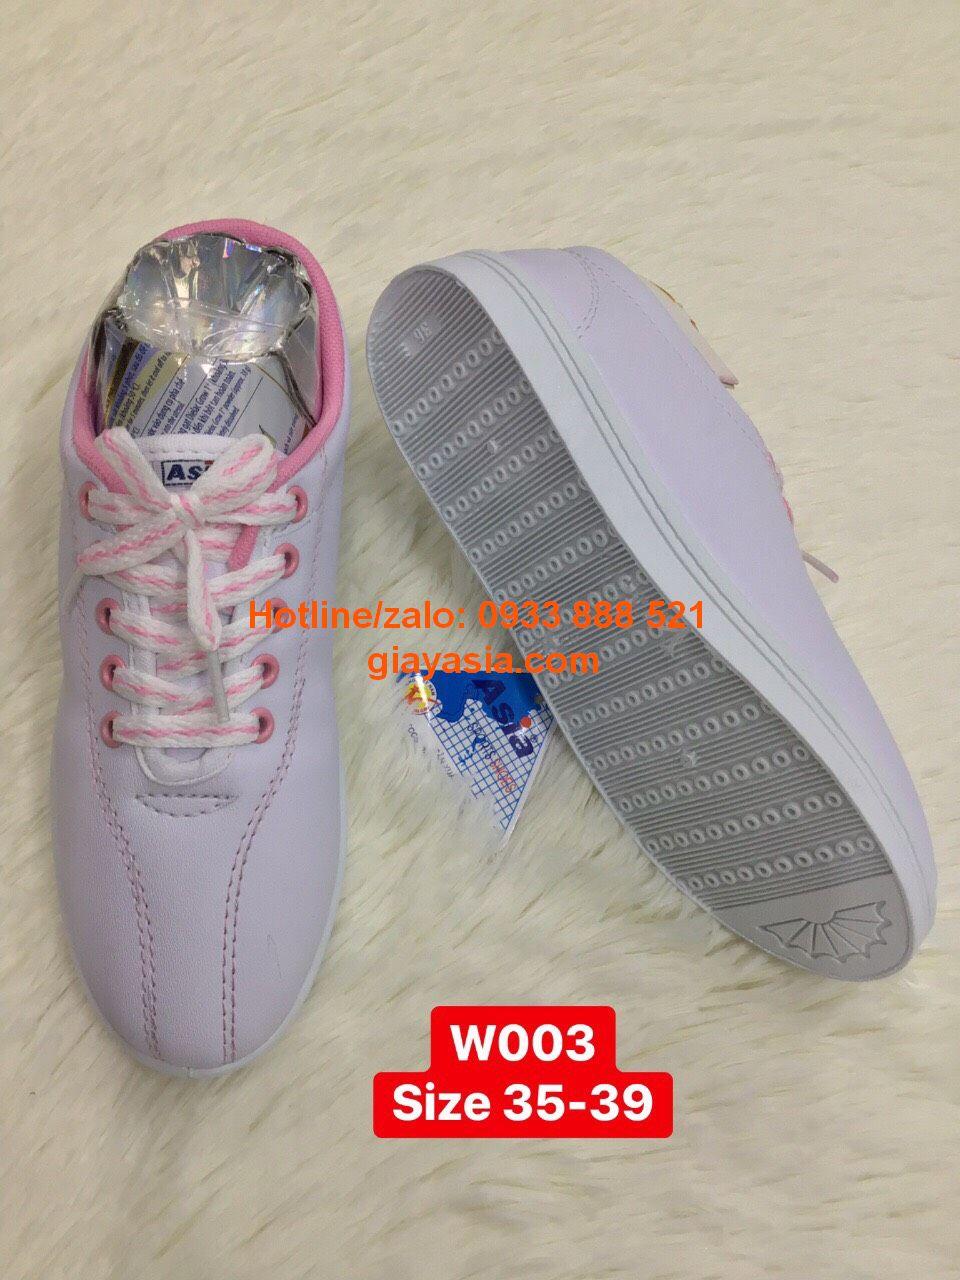 Giày thể thao asia trắng hồng